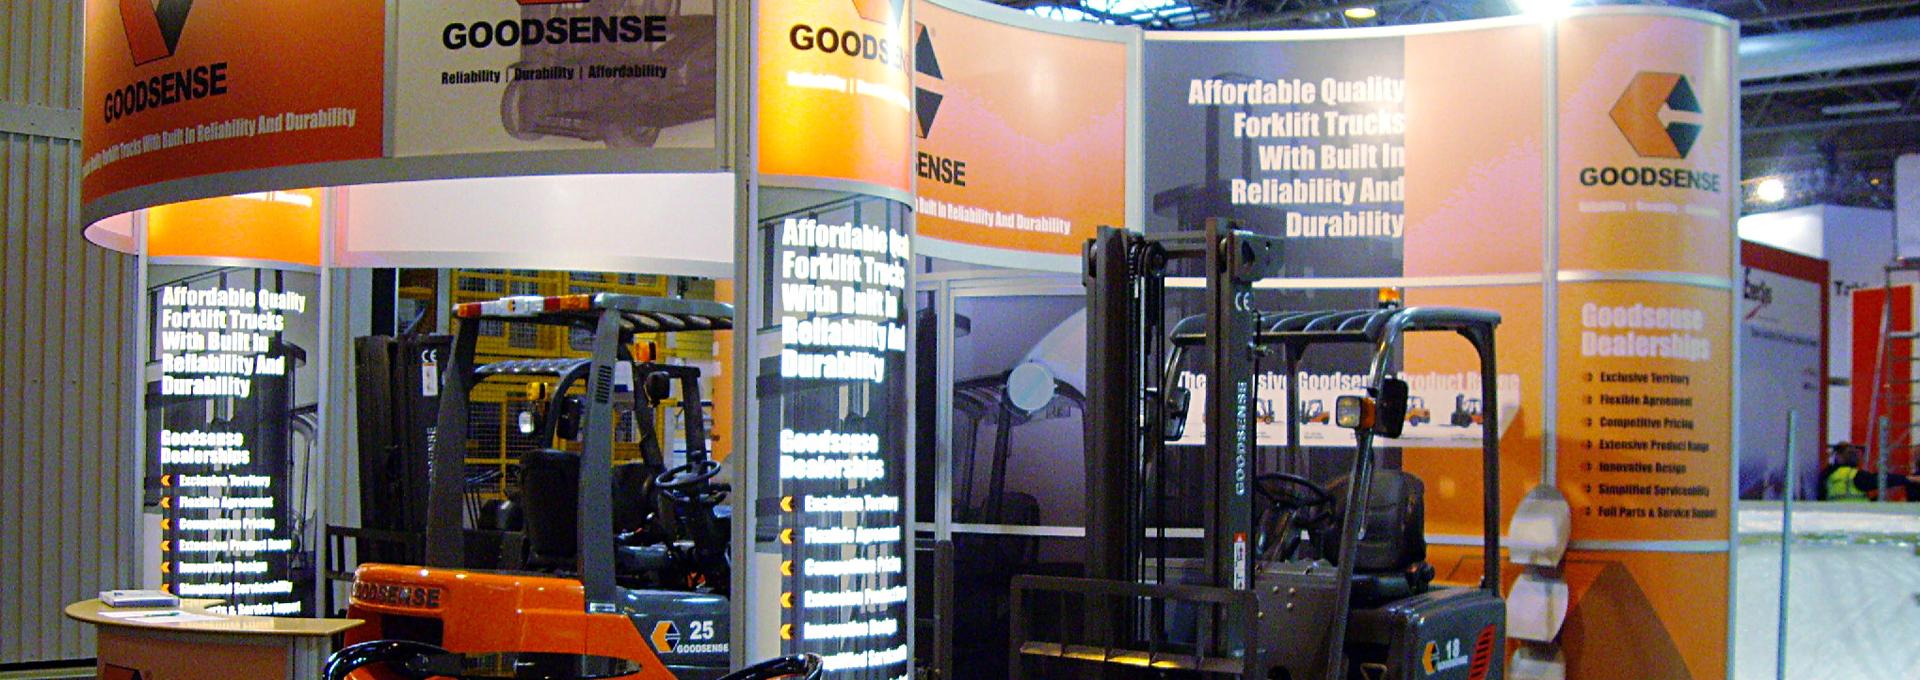 Goodsense Forklift Truck Sales